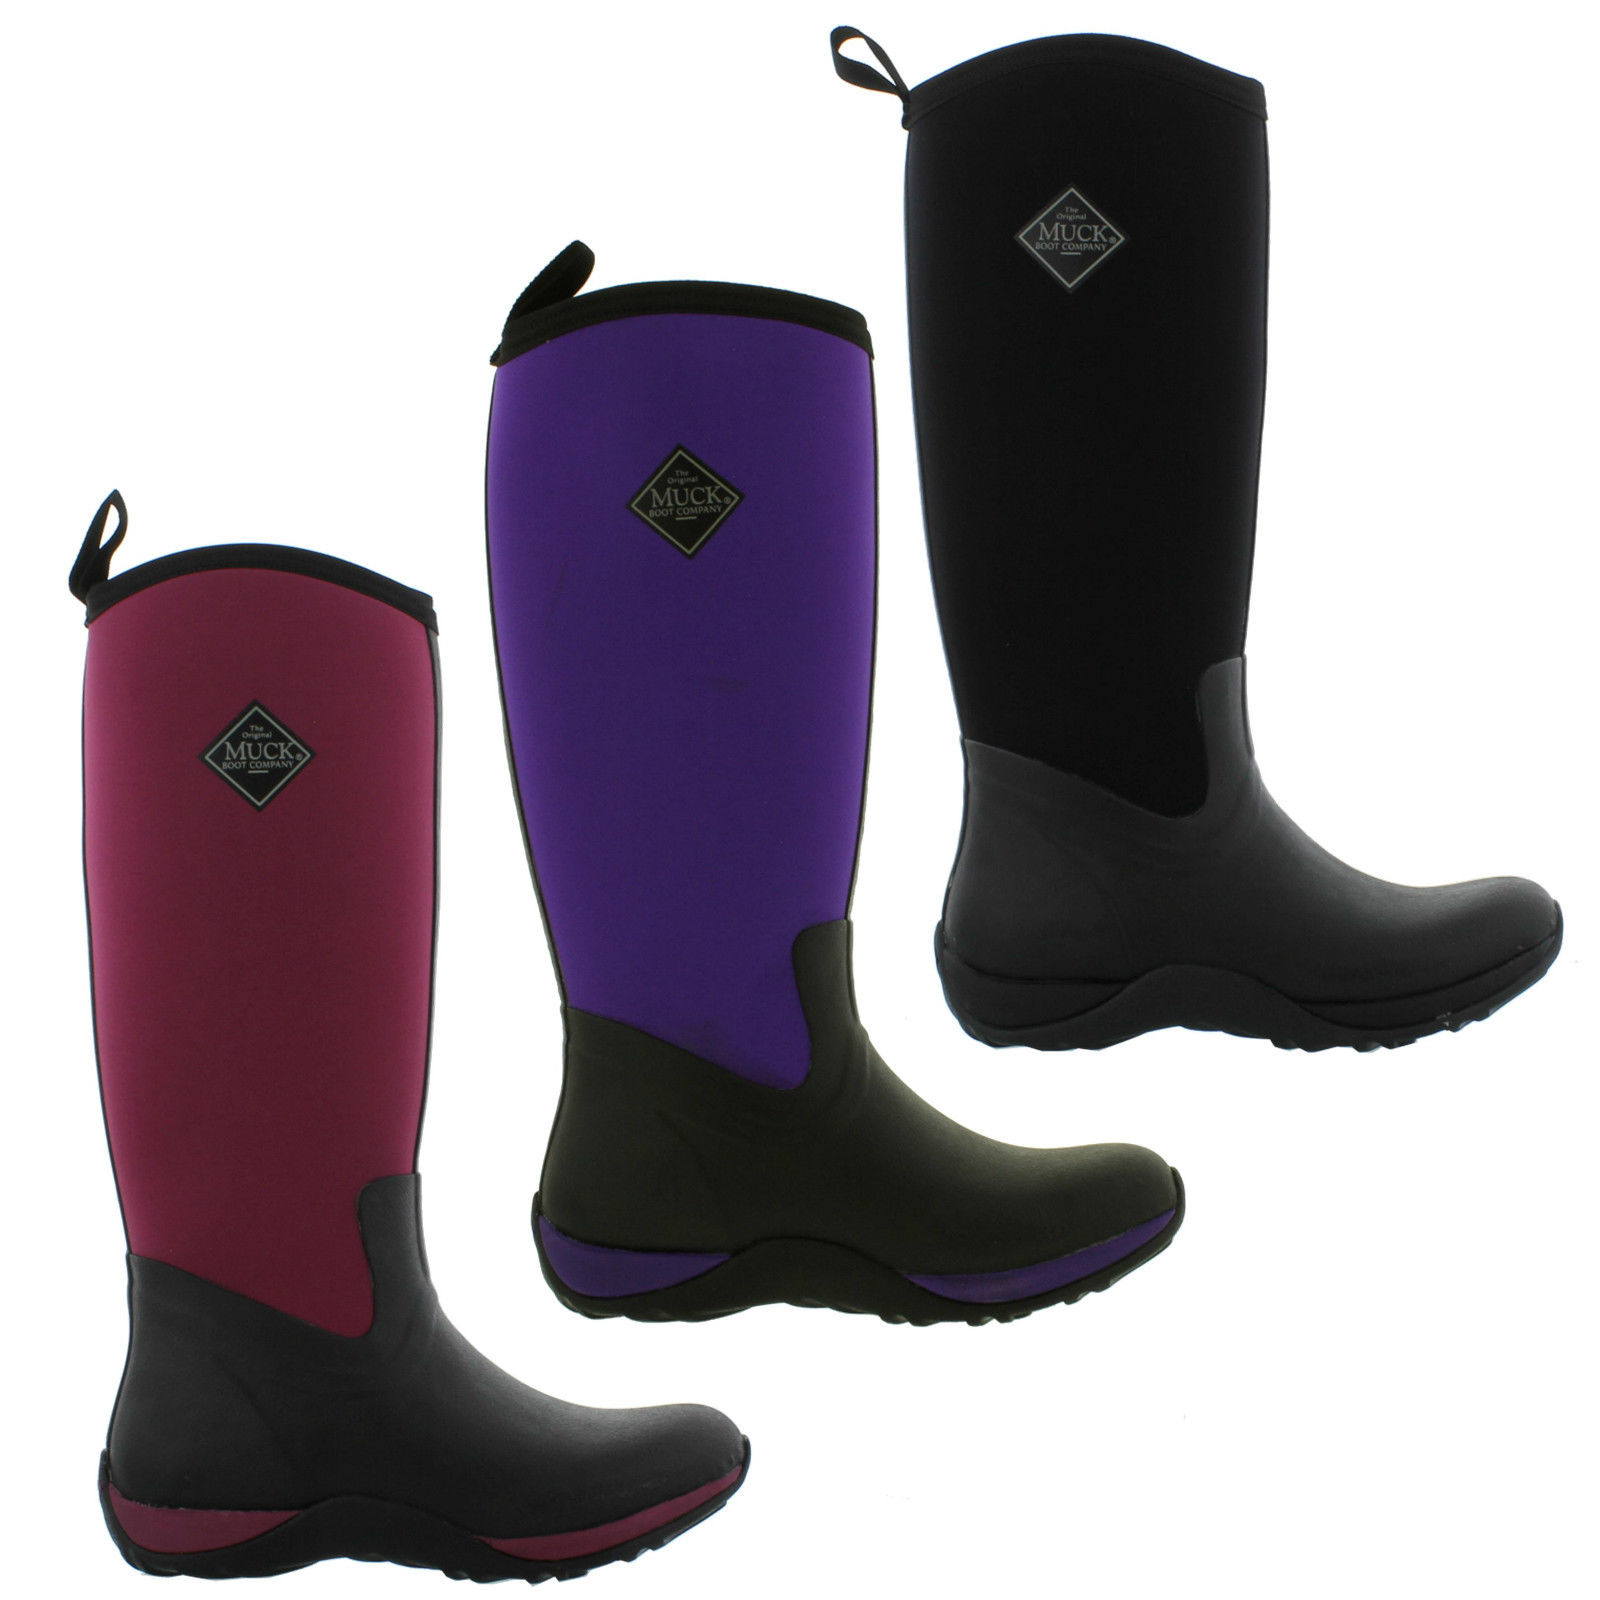 Muck Boots Arctic Sport II Tall Womens Wellington Neoprene Wellies Size UK 4-8